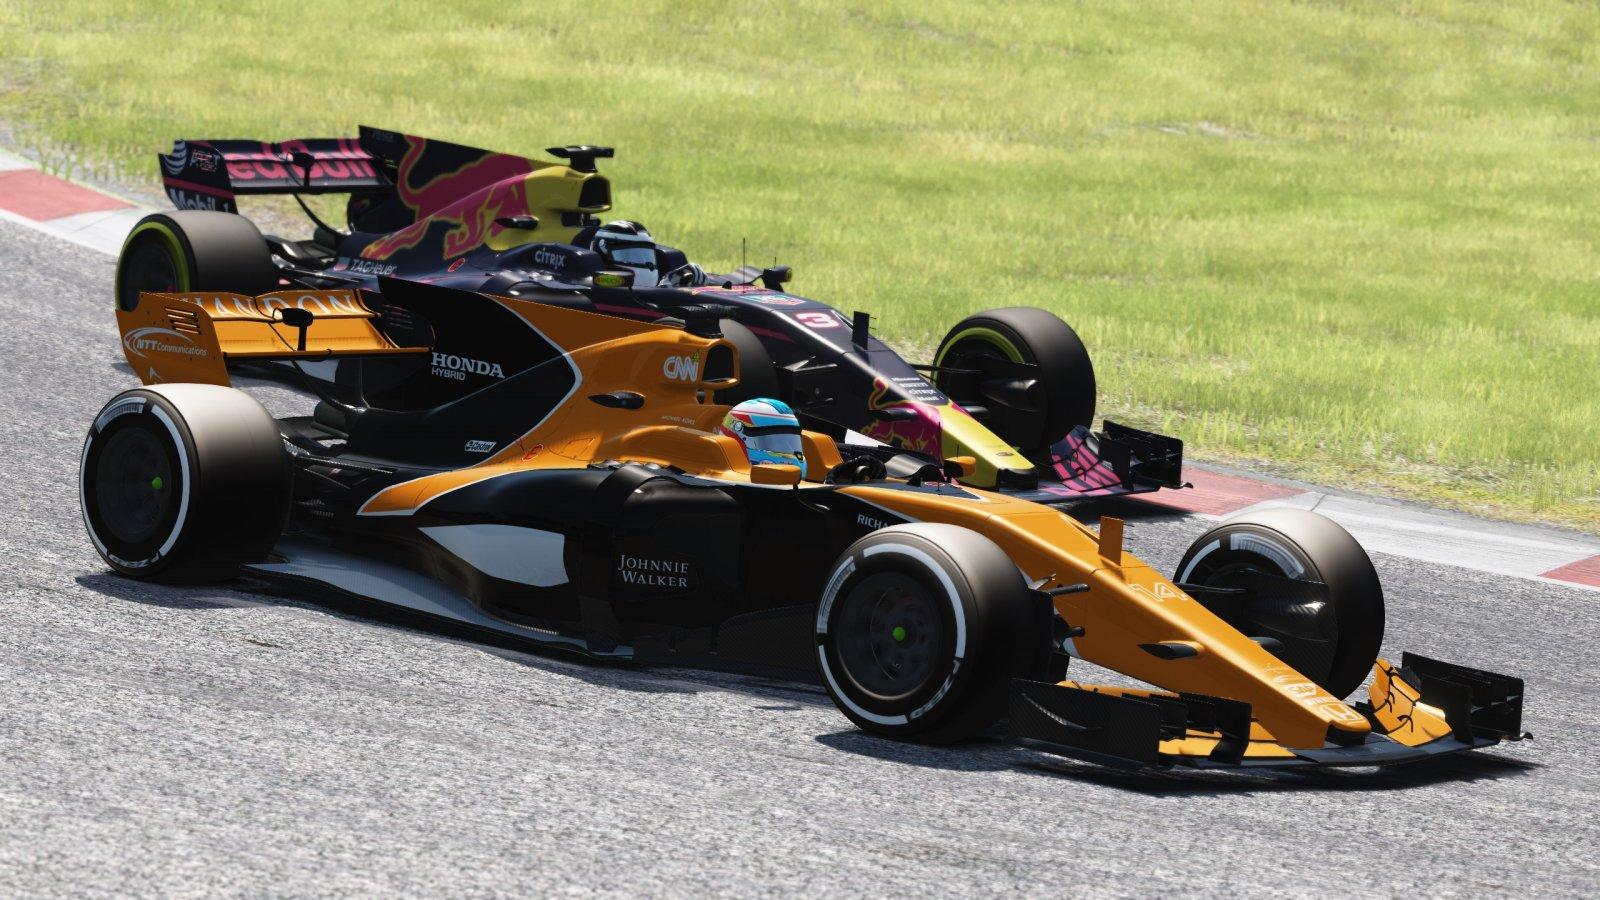 Screenshot-rss-formula-hybrid-2017-s1-ks-barcelona-11-3-117-21-57-55.jpg